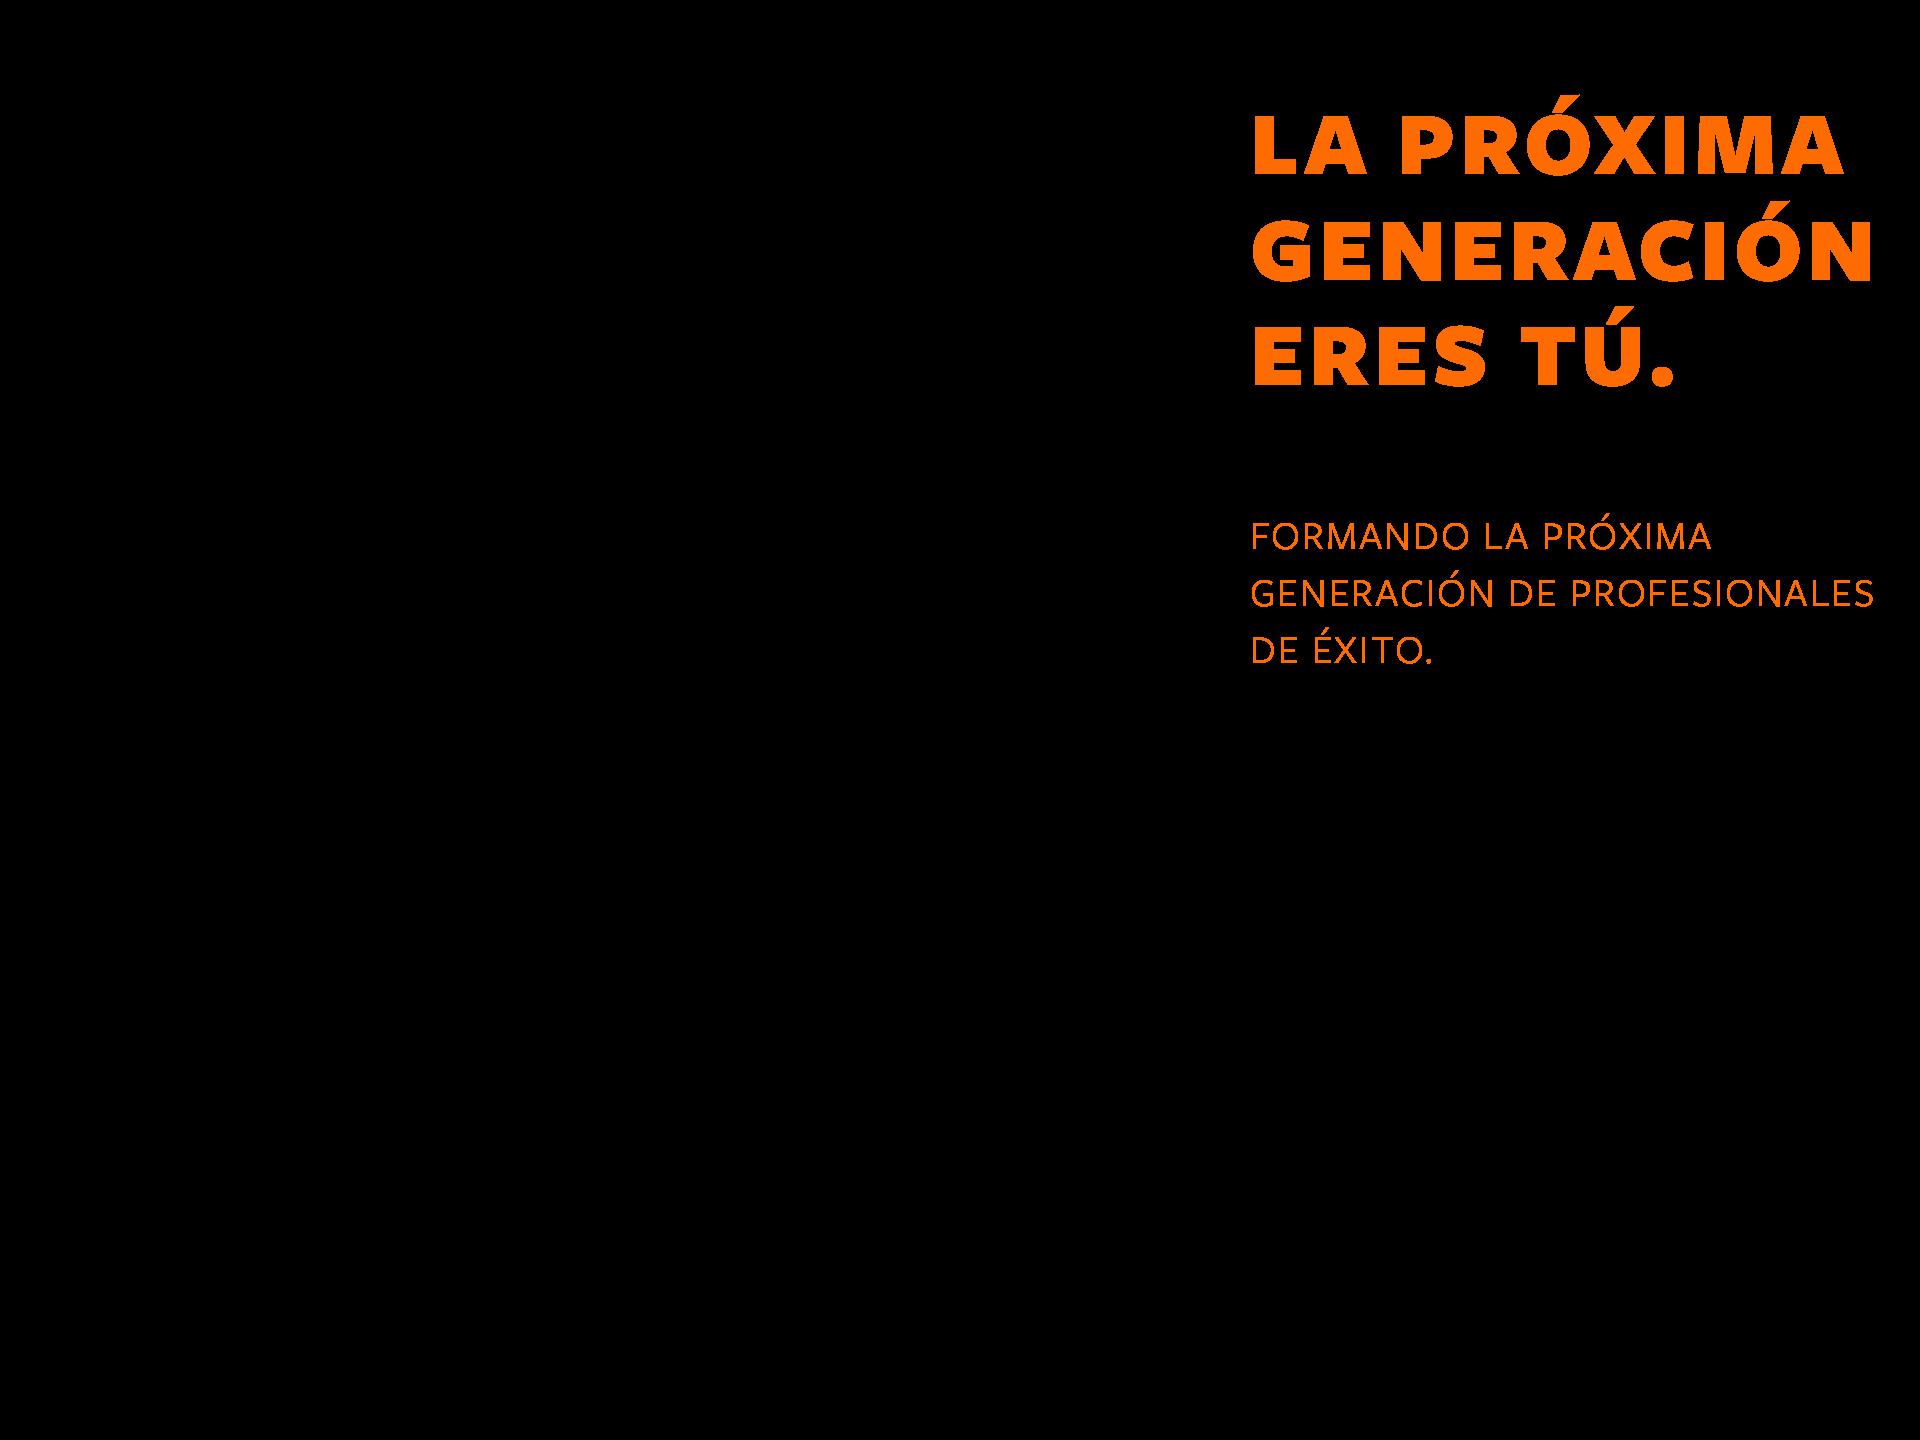 190423_jhonatan_Medina_Caguana_EB_TYPO